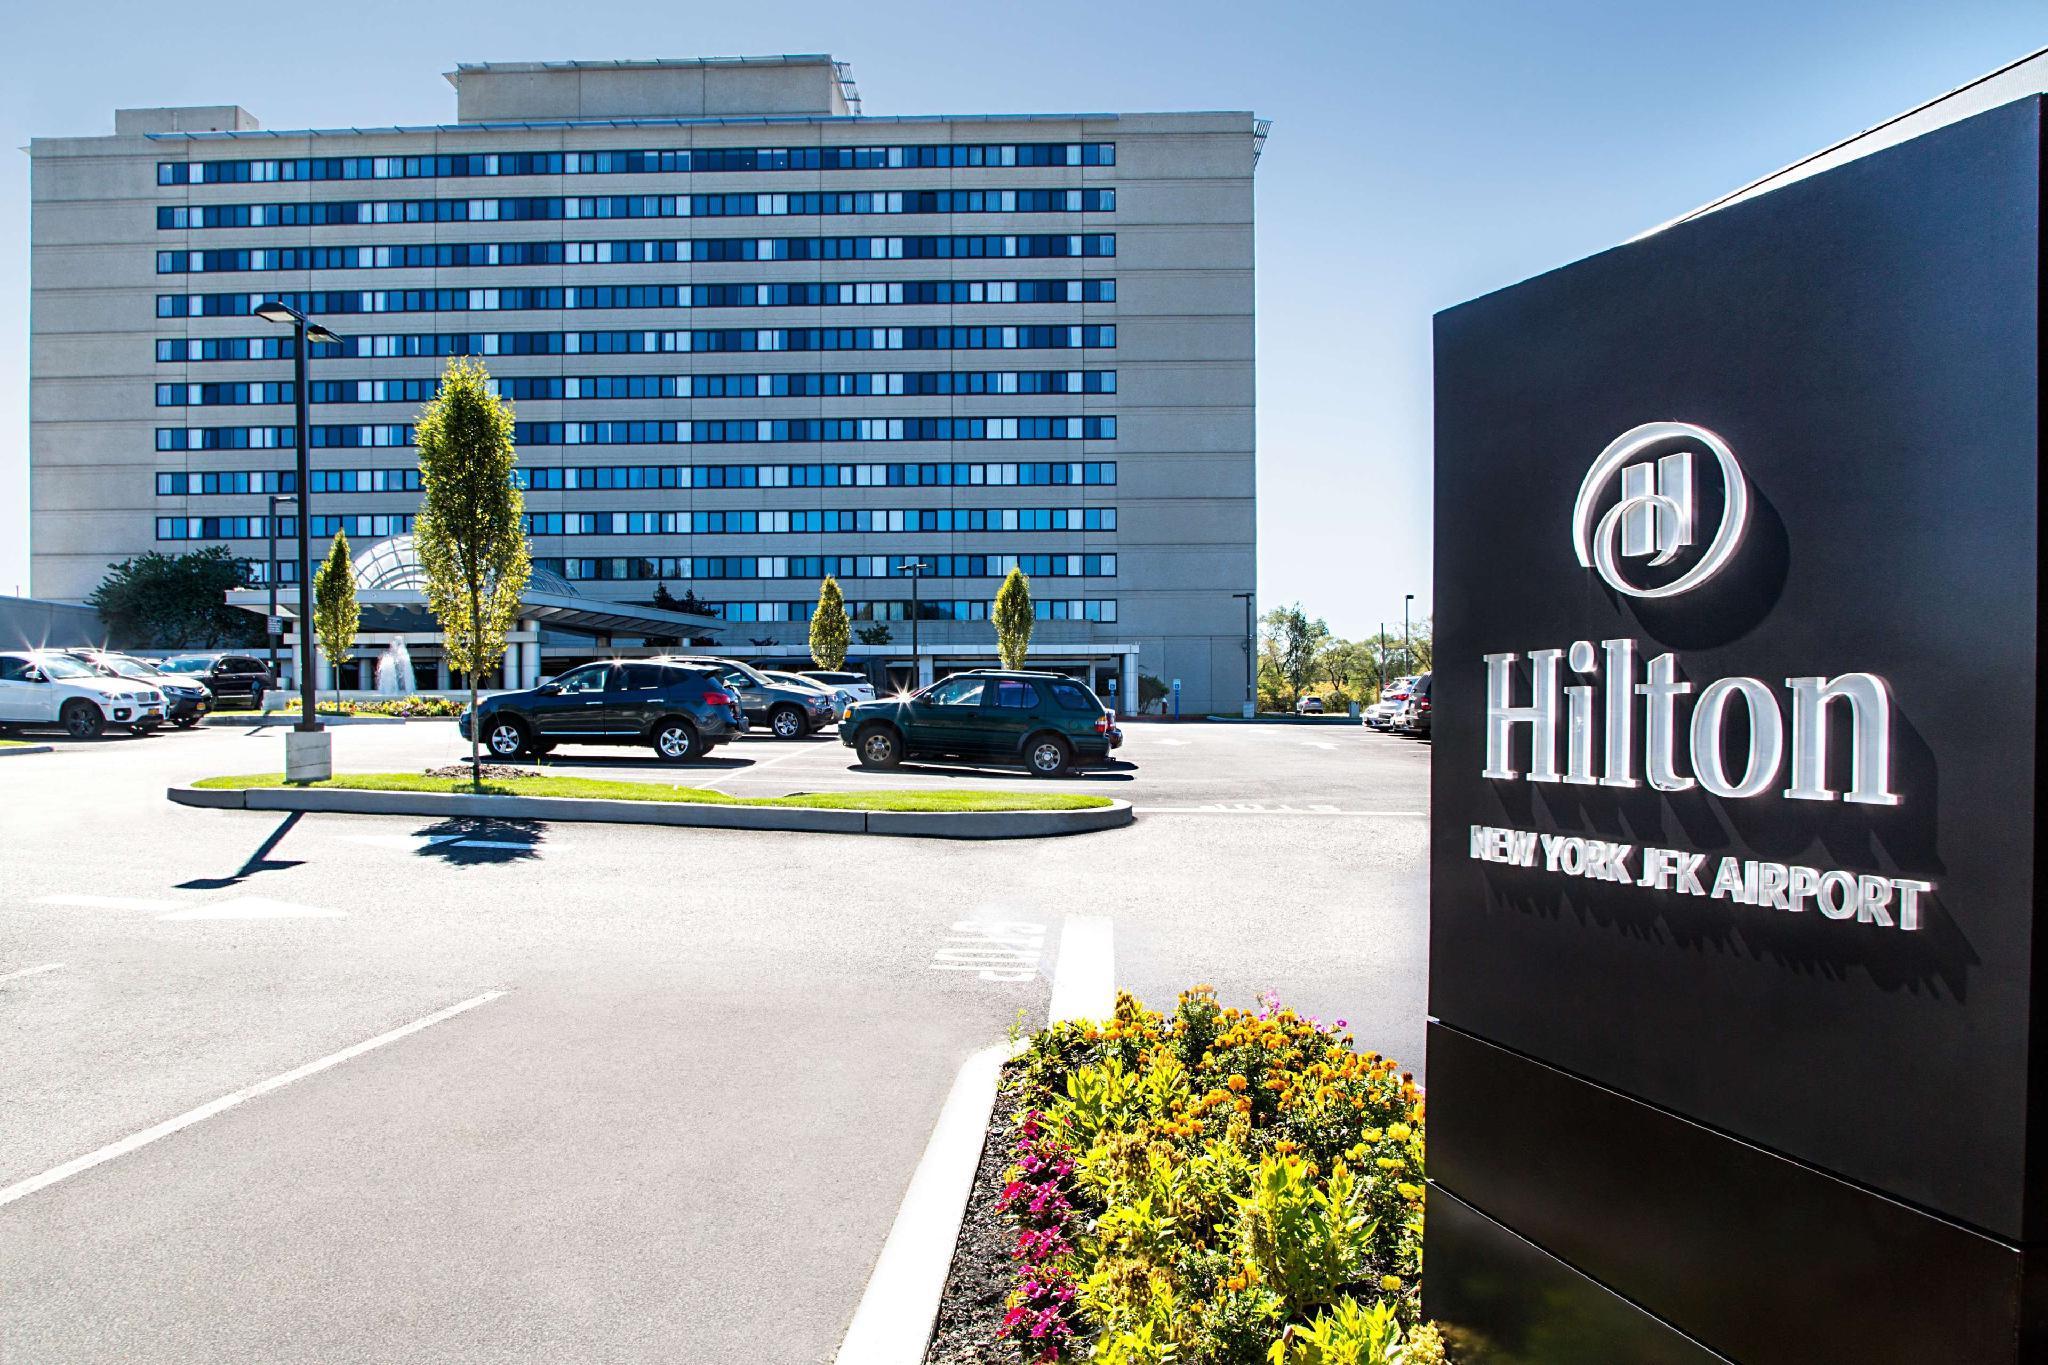 Hilton New York JFK Airport Hotel